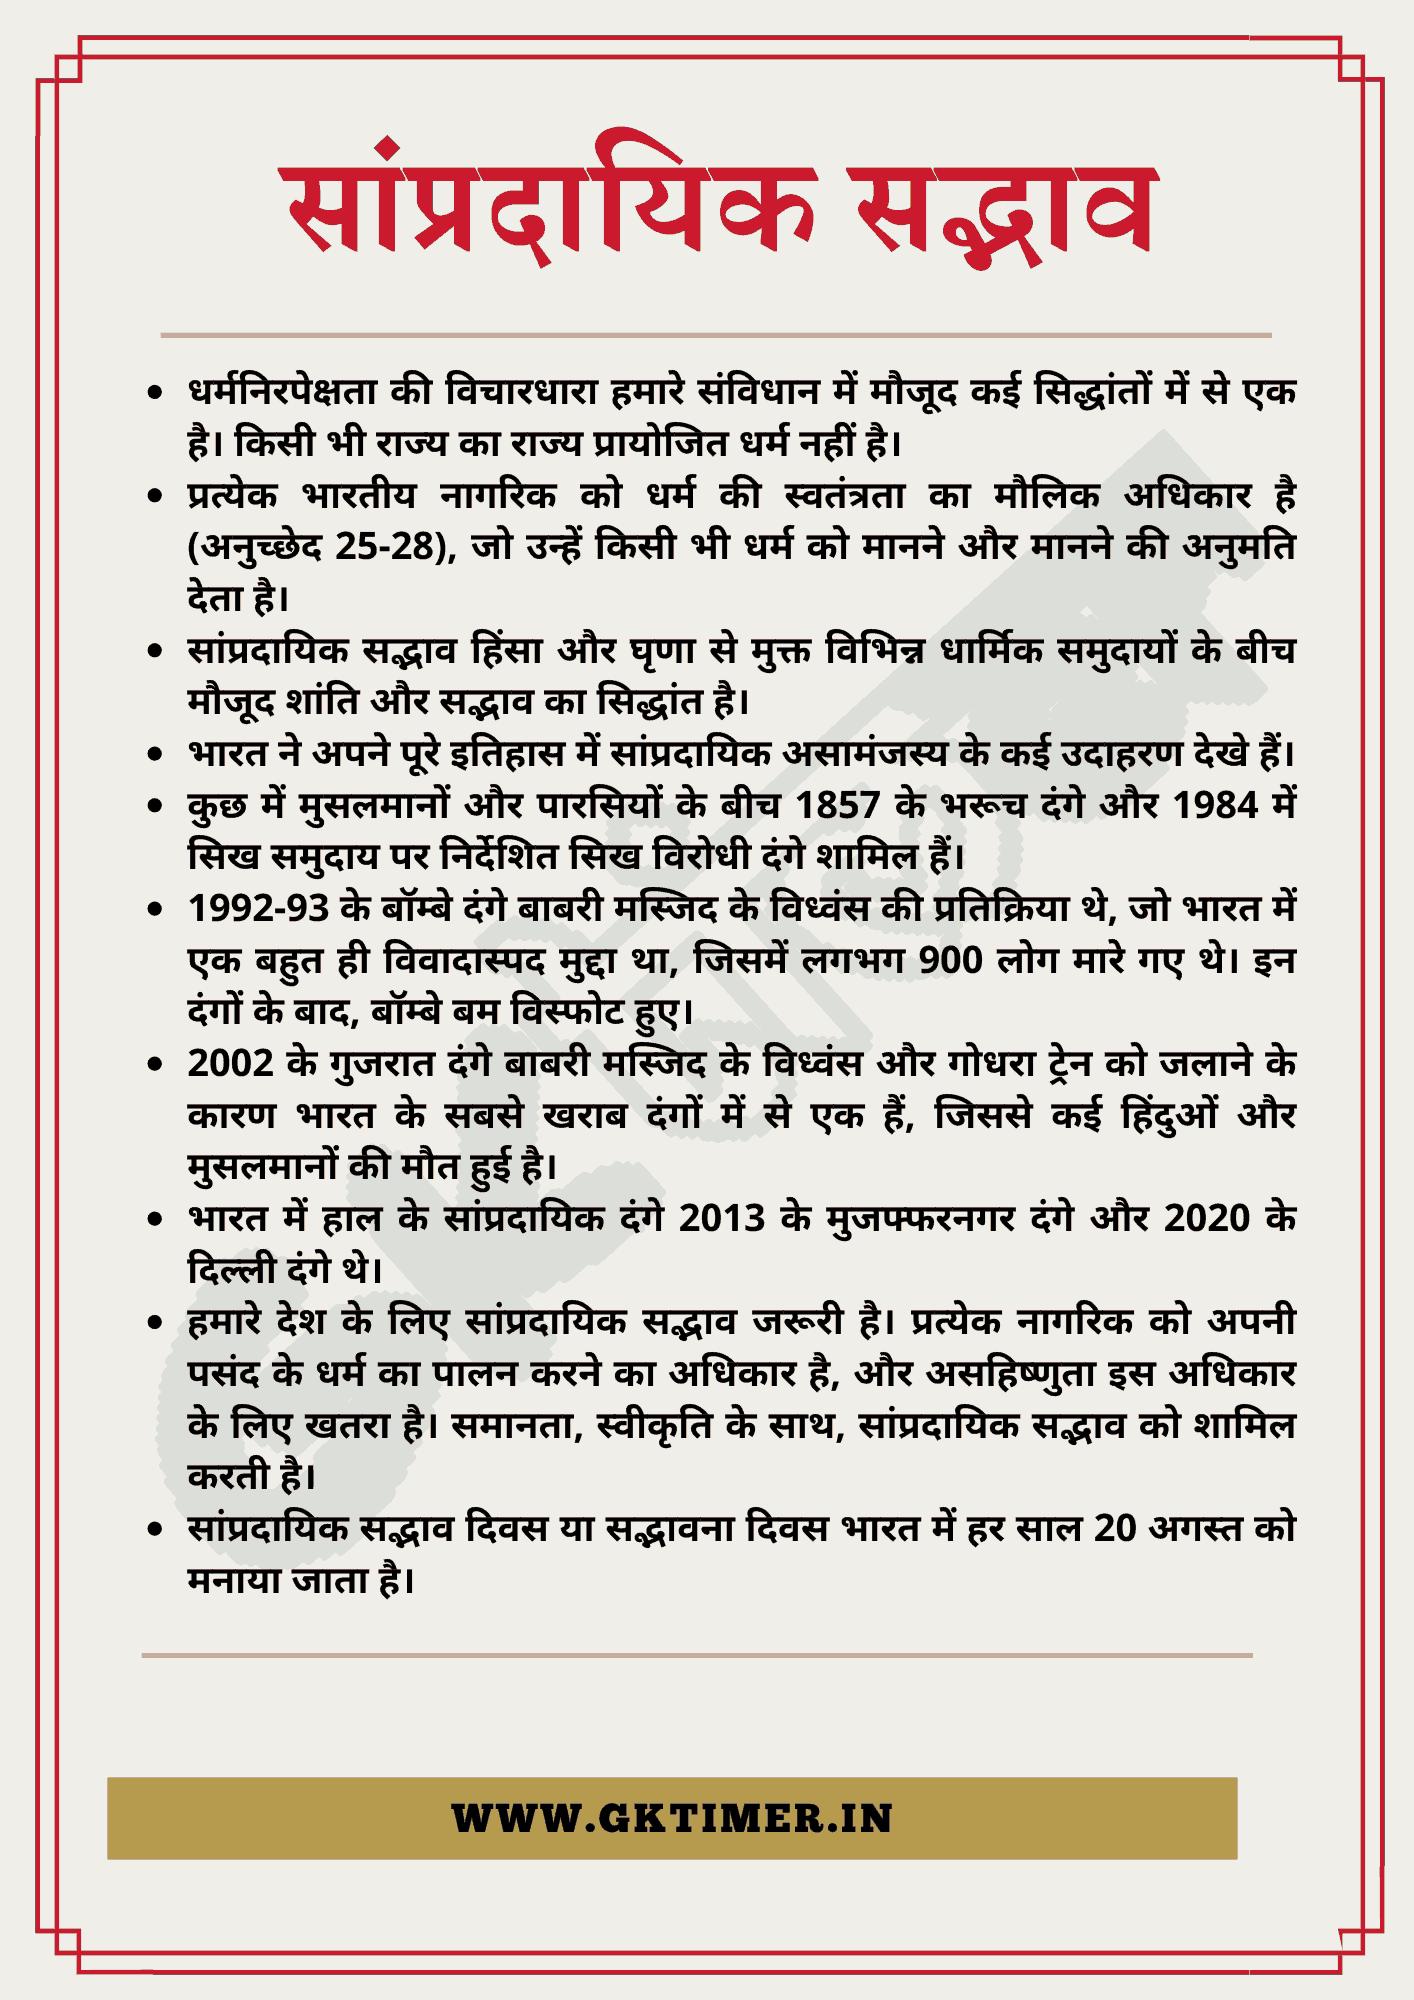 सांप्रदायिक सद्भाव पर निबंध   Long and Short on Communal Harmony in Hindi   10 Lines on Communal Harmony in Hindi